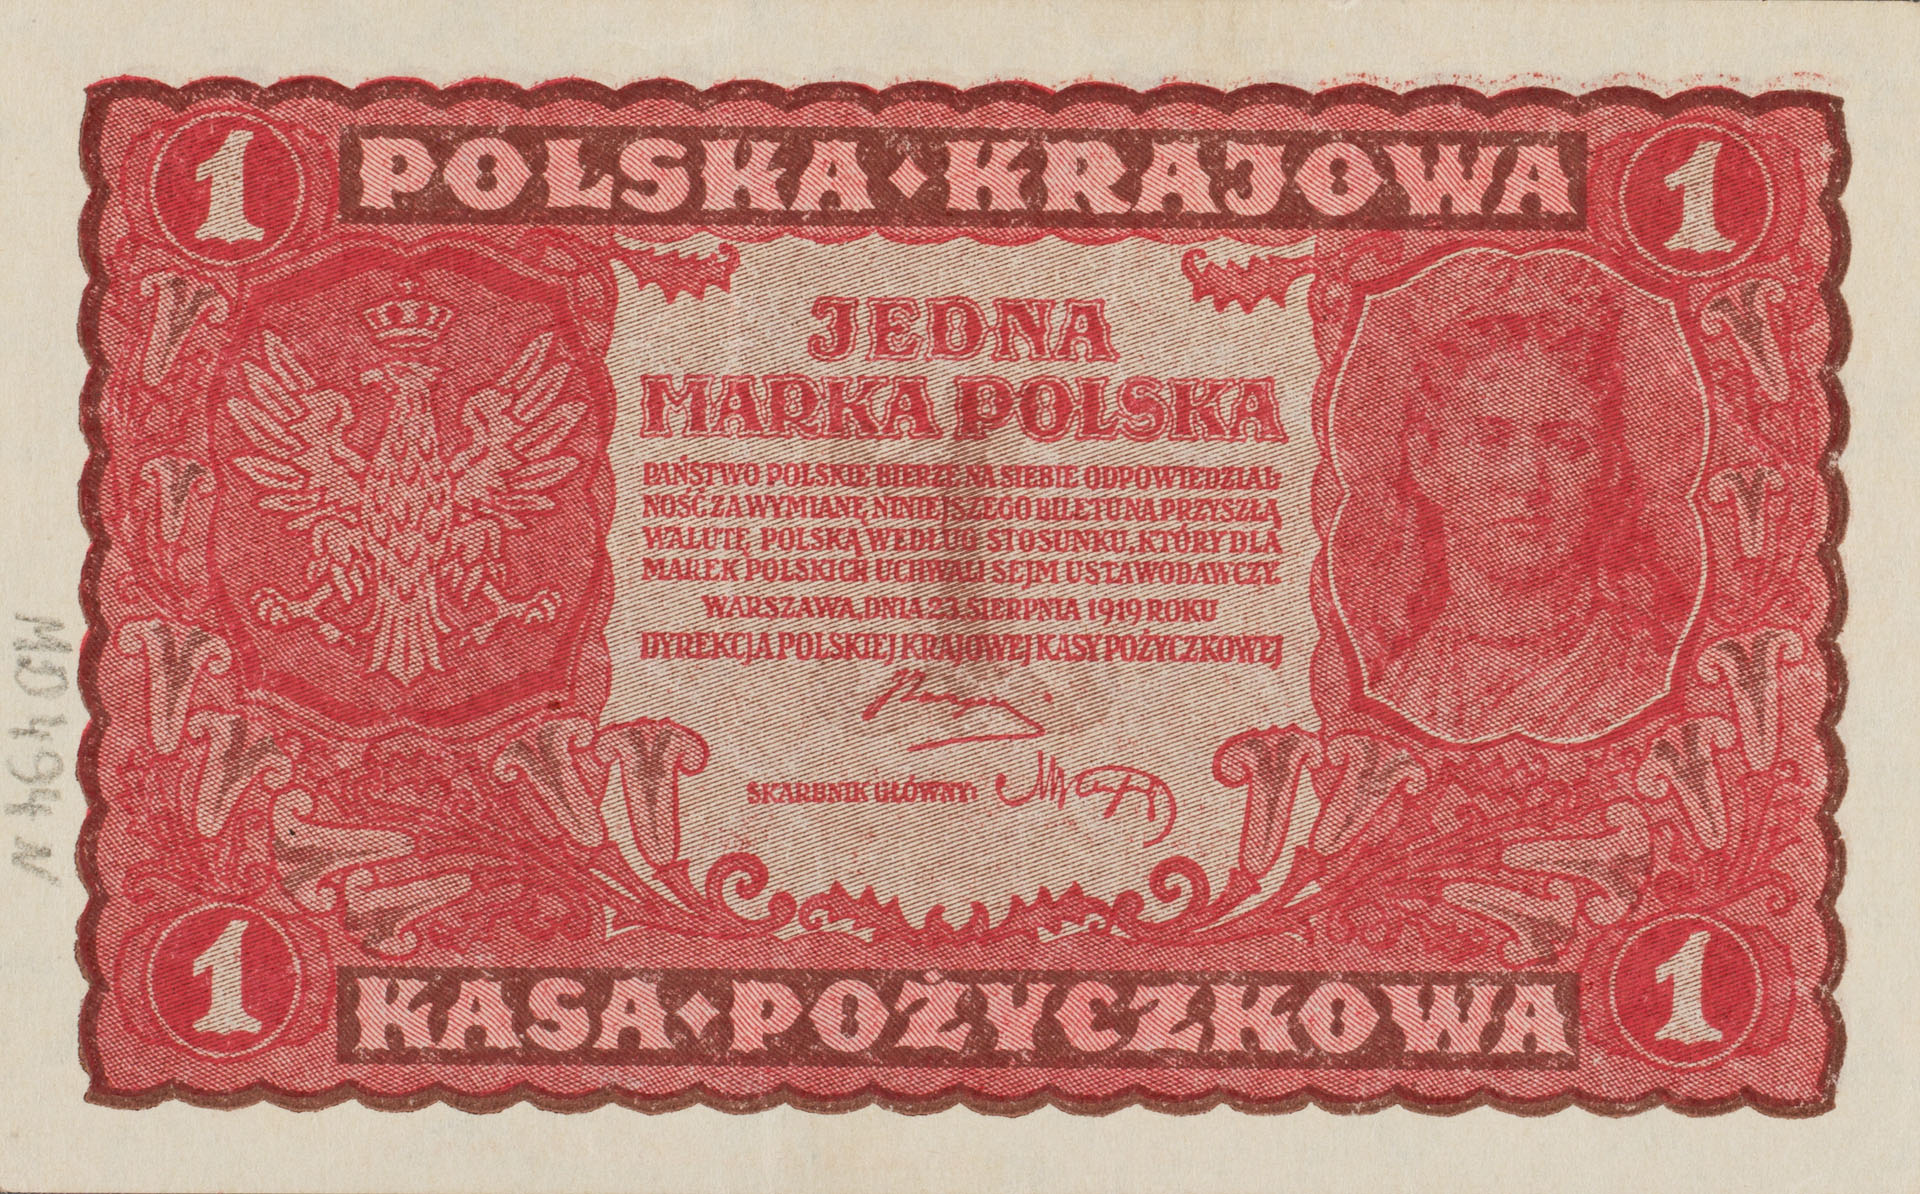 Banknot 1 marka polska